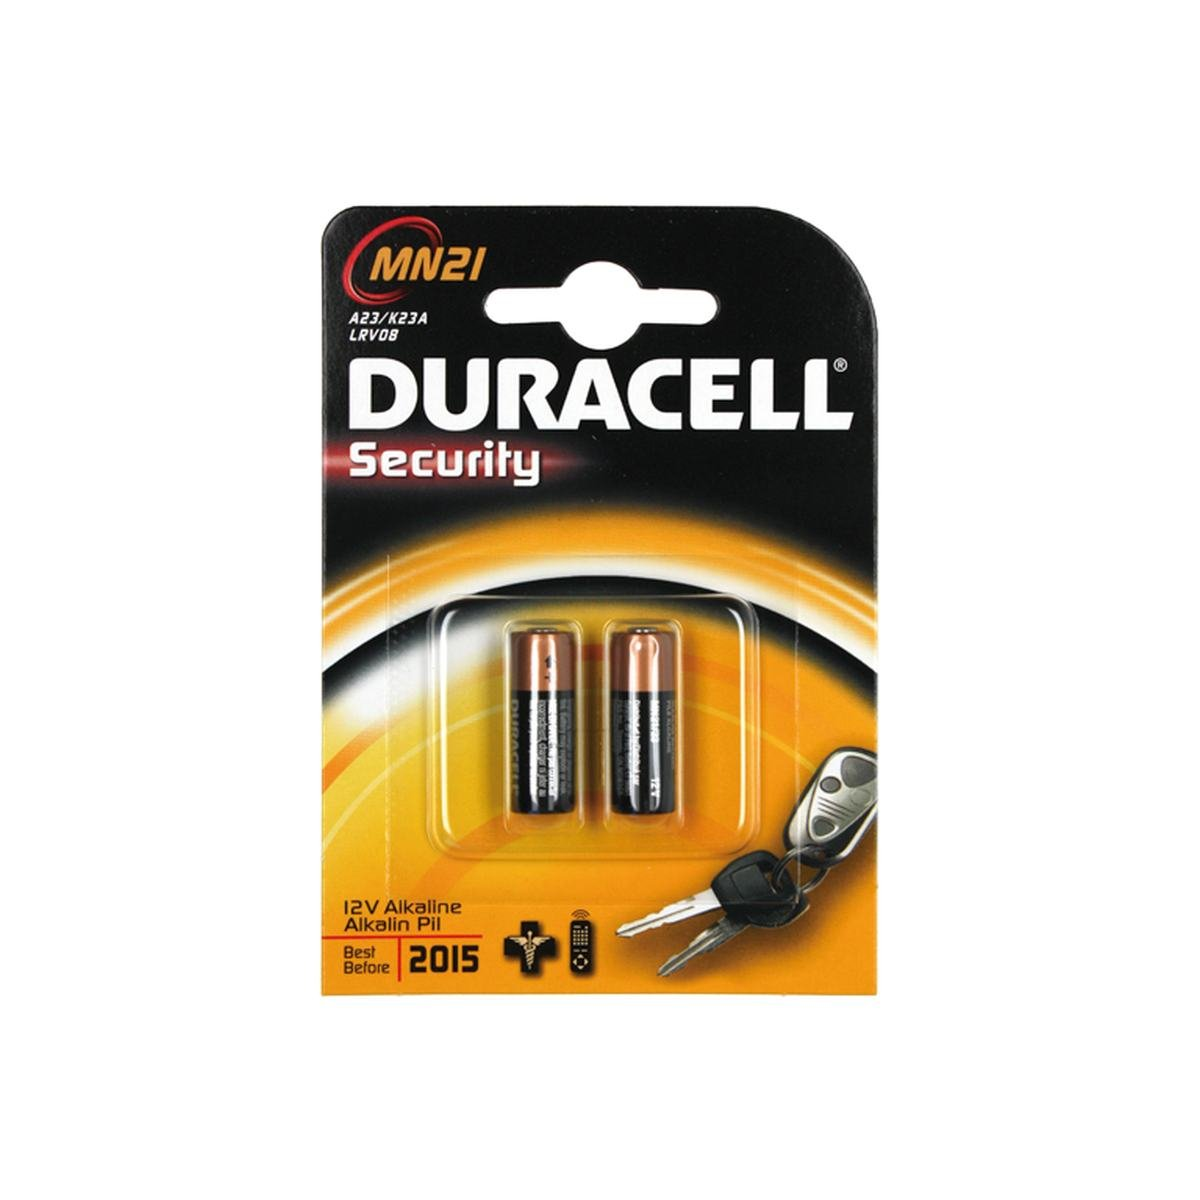 Batteri 12V LRV08 / MN21 2 stk. pakke - Duracell